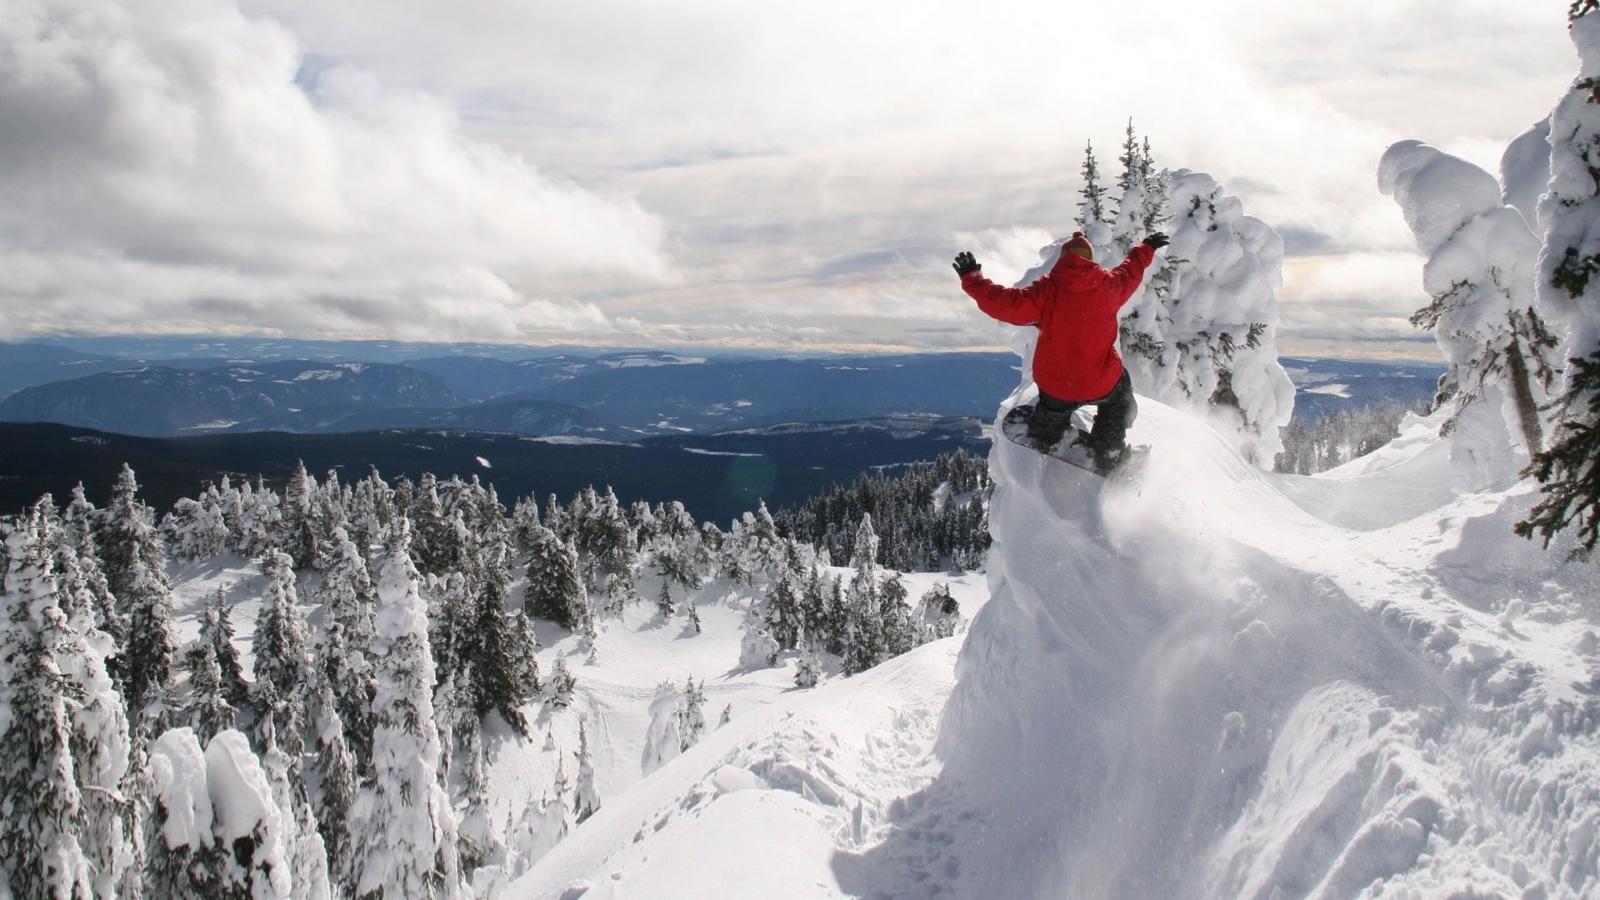 http://1.bp.blogspot.com/-Q0qVwqSmprM/Tw0mz3D_UrI/AAAAAAAABTg/PReX-lmf4jw/s1600/Snowboarding+Wallpaper+2.jpg